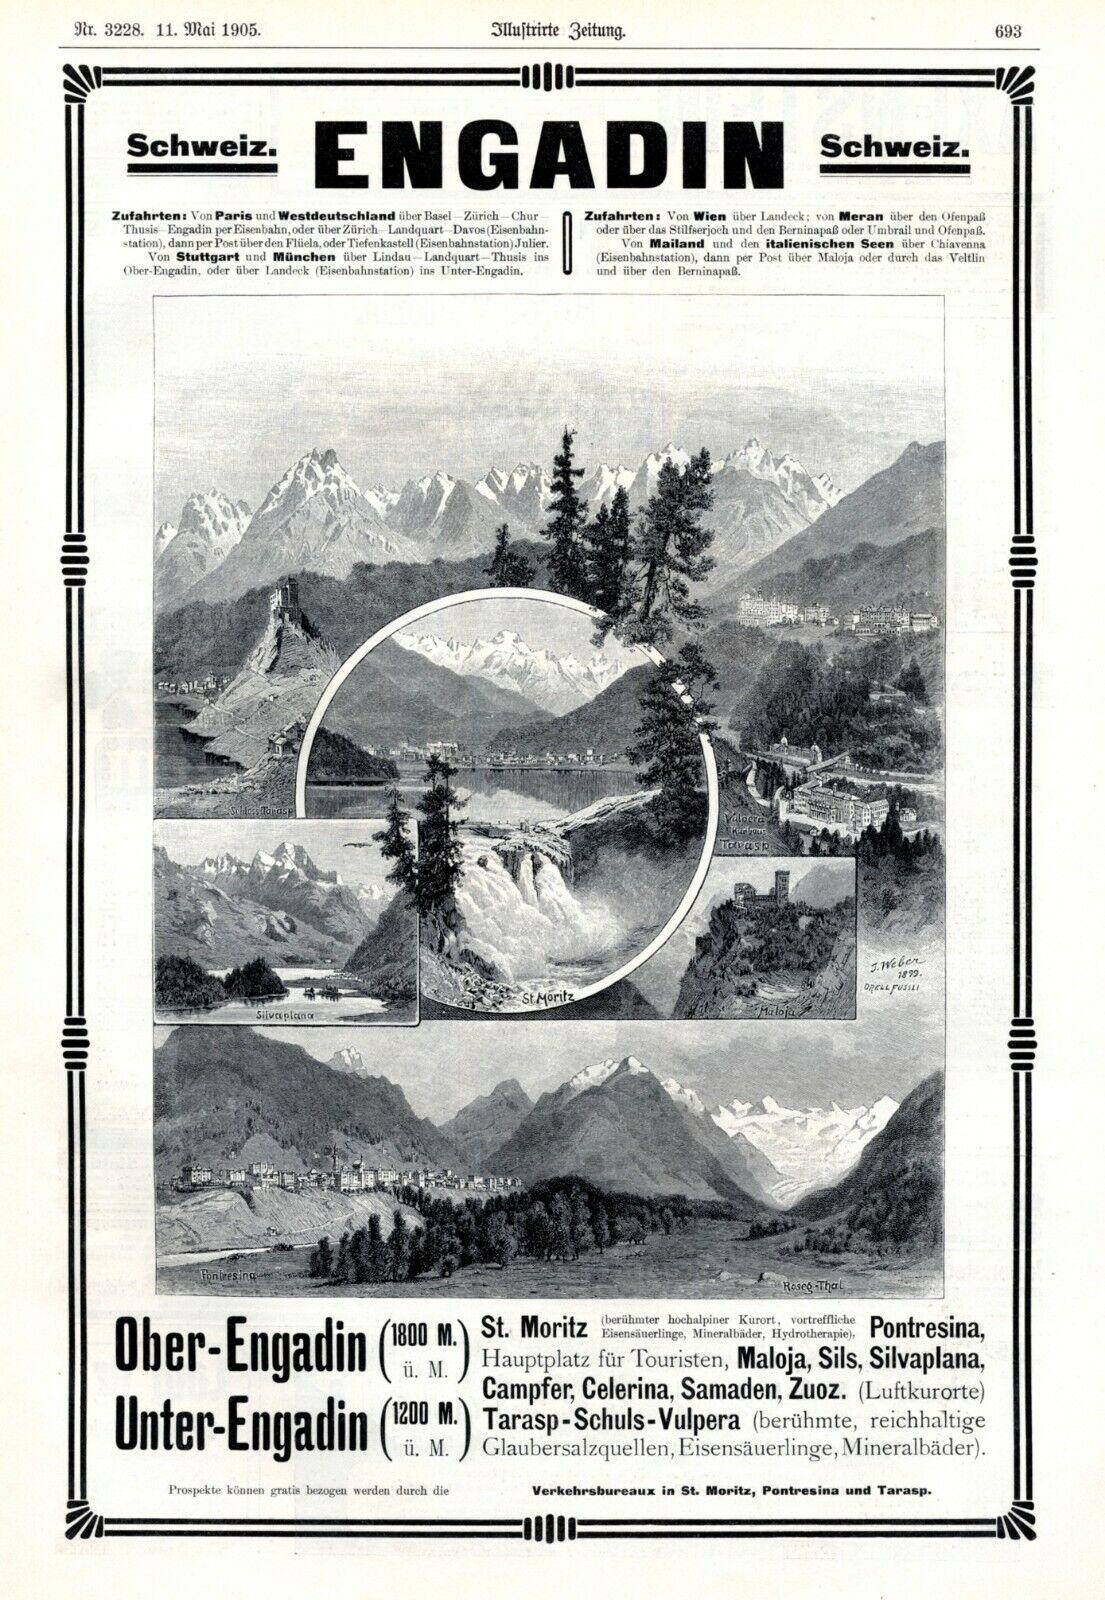 Engadin Schweiz XL Reklame 1905 St. Moritz Maloja Pontresina Tarasp Roseh-Thal